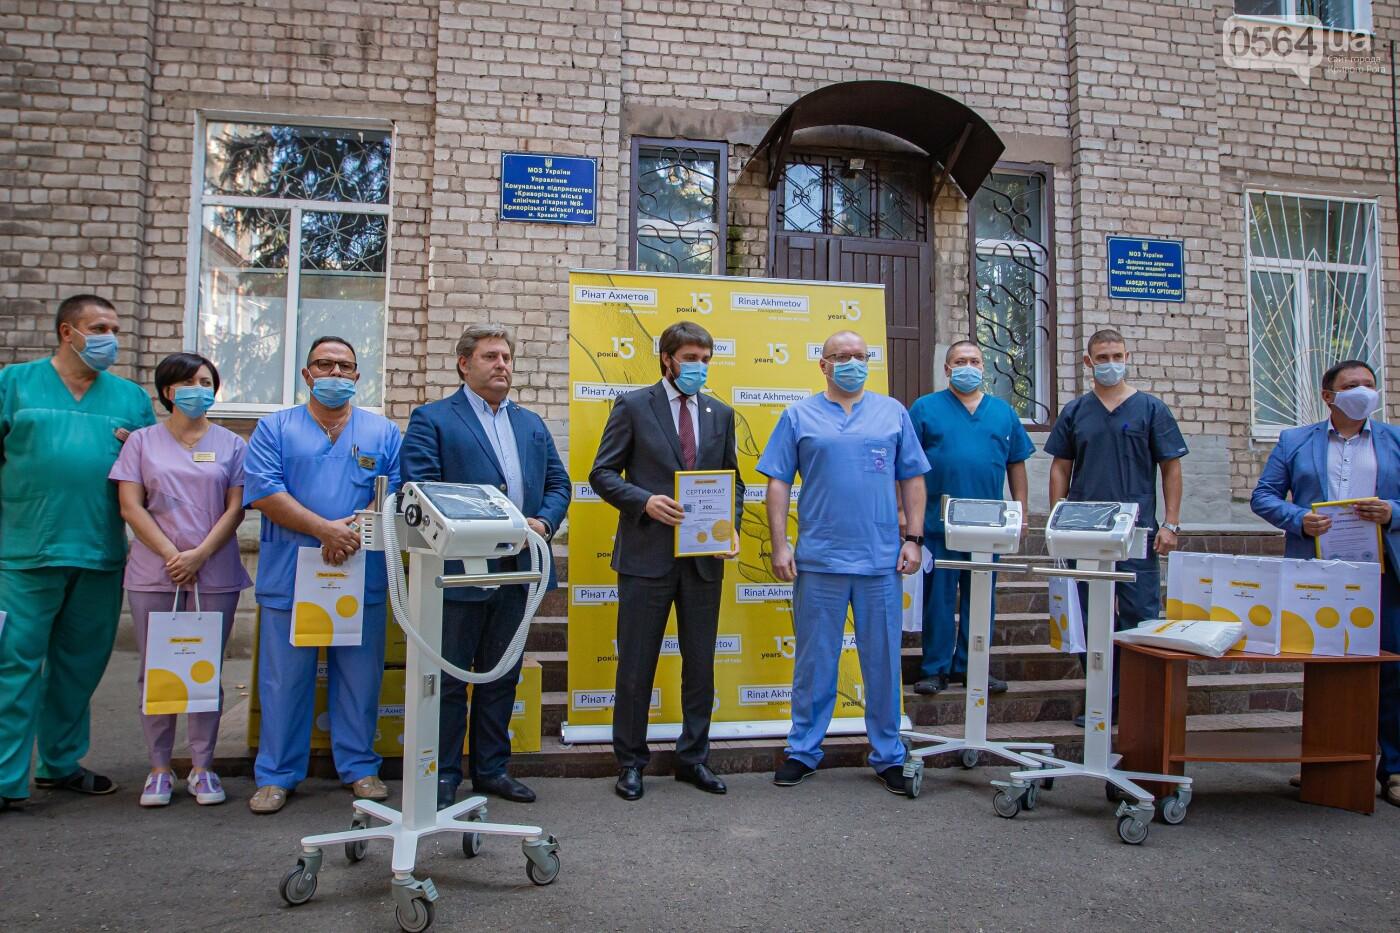 Фонд Рината Ахметова передал 3 аппарата ИВЛ больнице Кривого Рога, фото-4